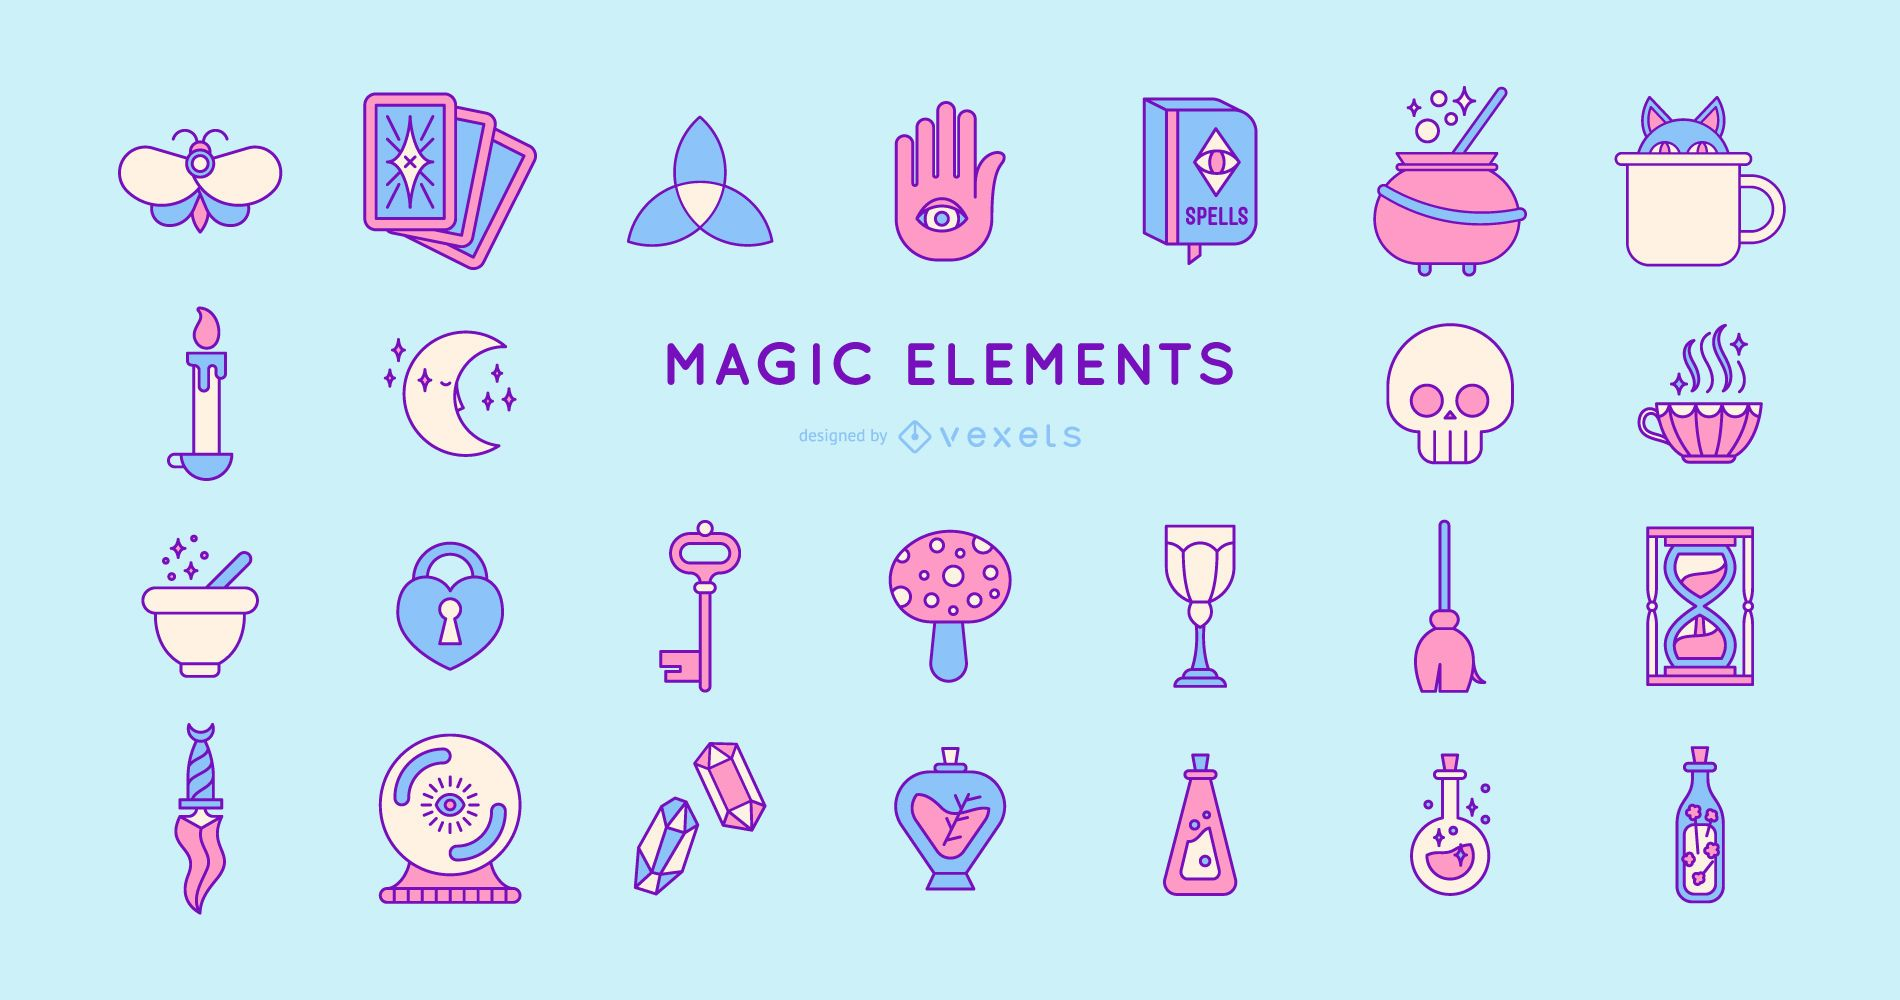 Pacote de design de elementos m?gicos coloridos